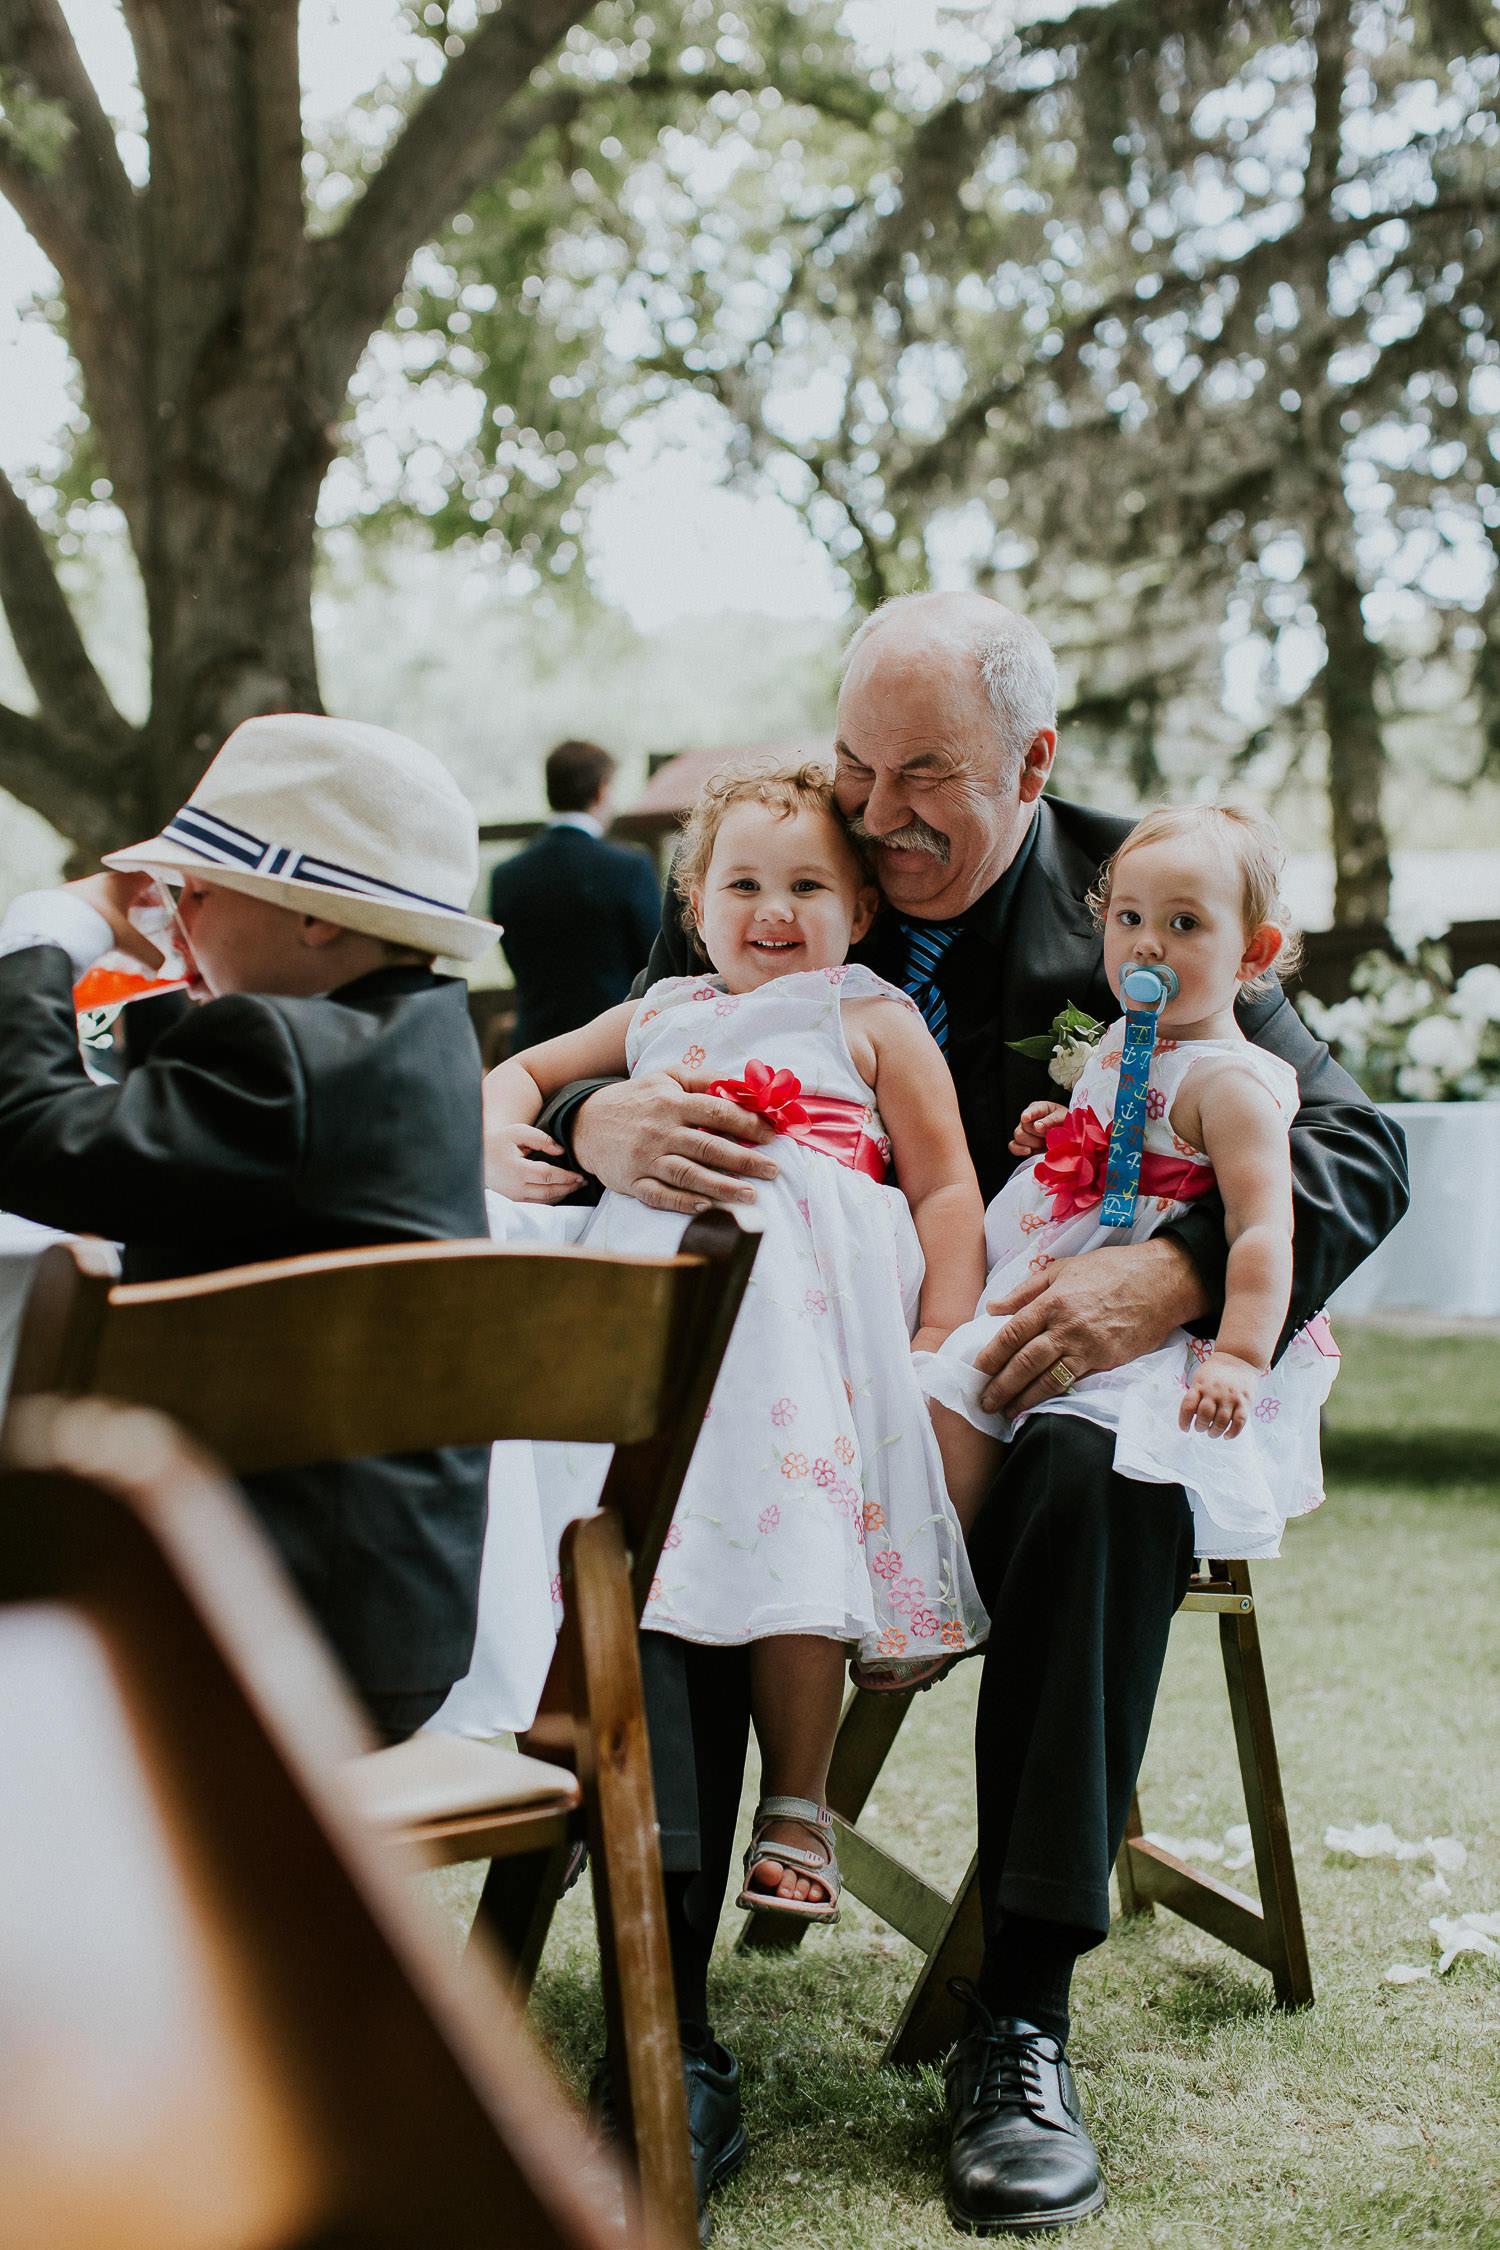 summer-backyard-wedding-in-alberta-sarah-pukin-0135